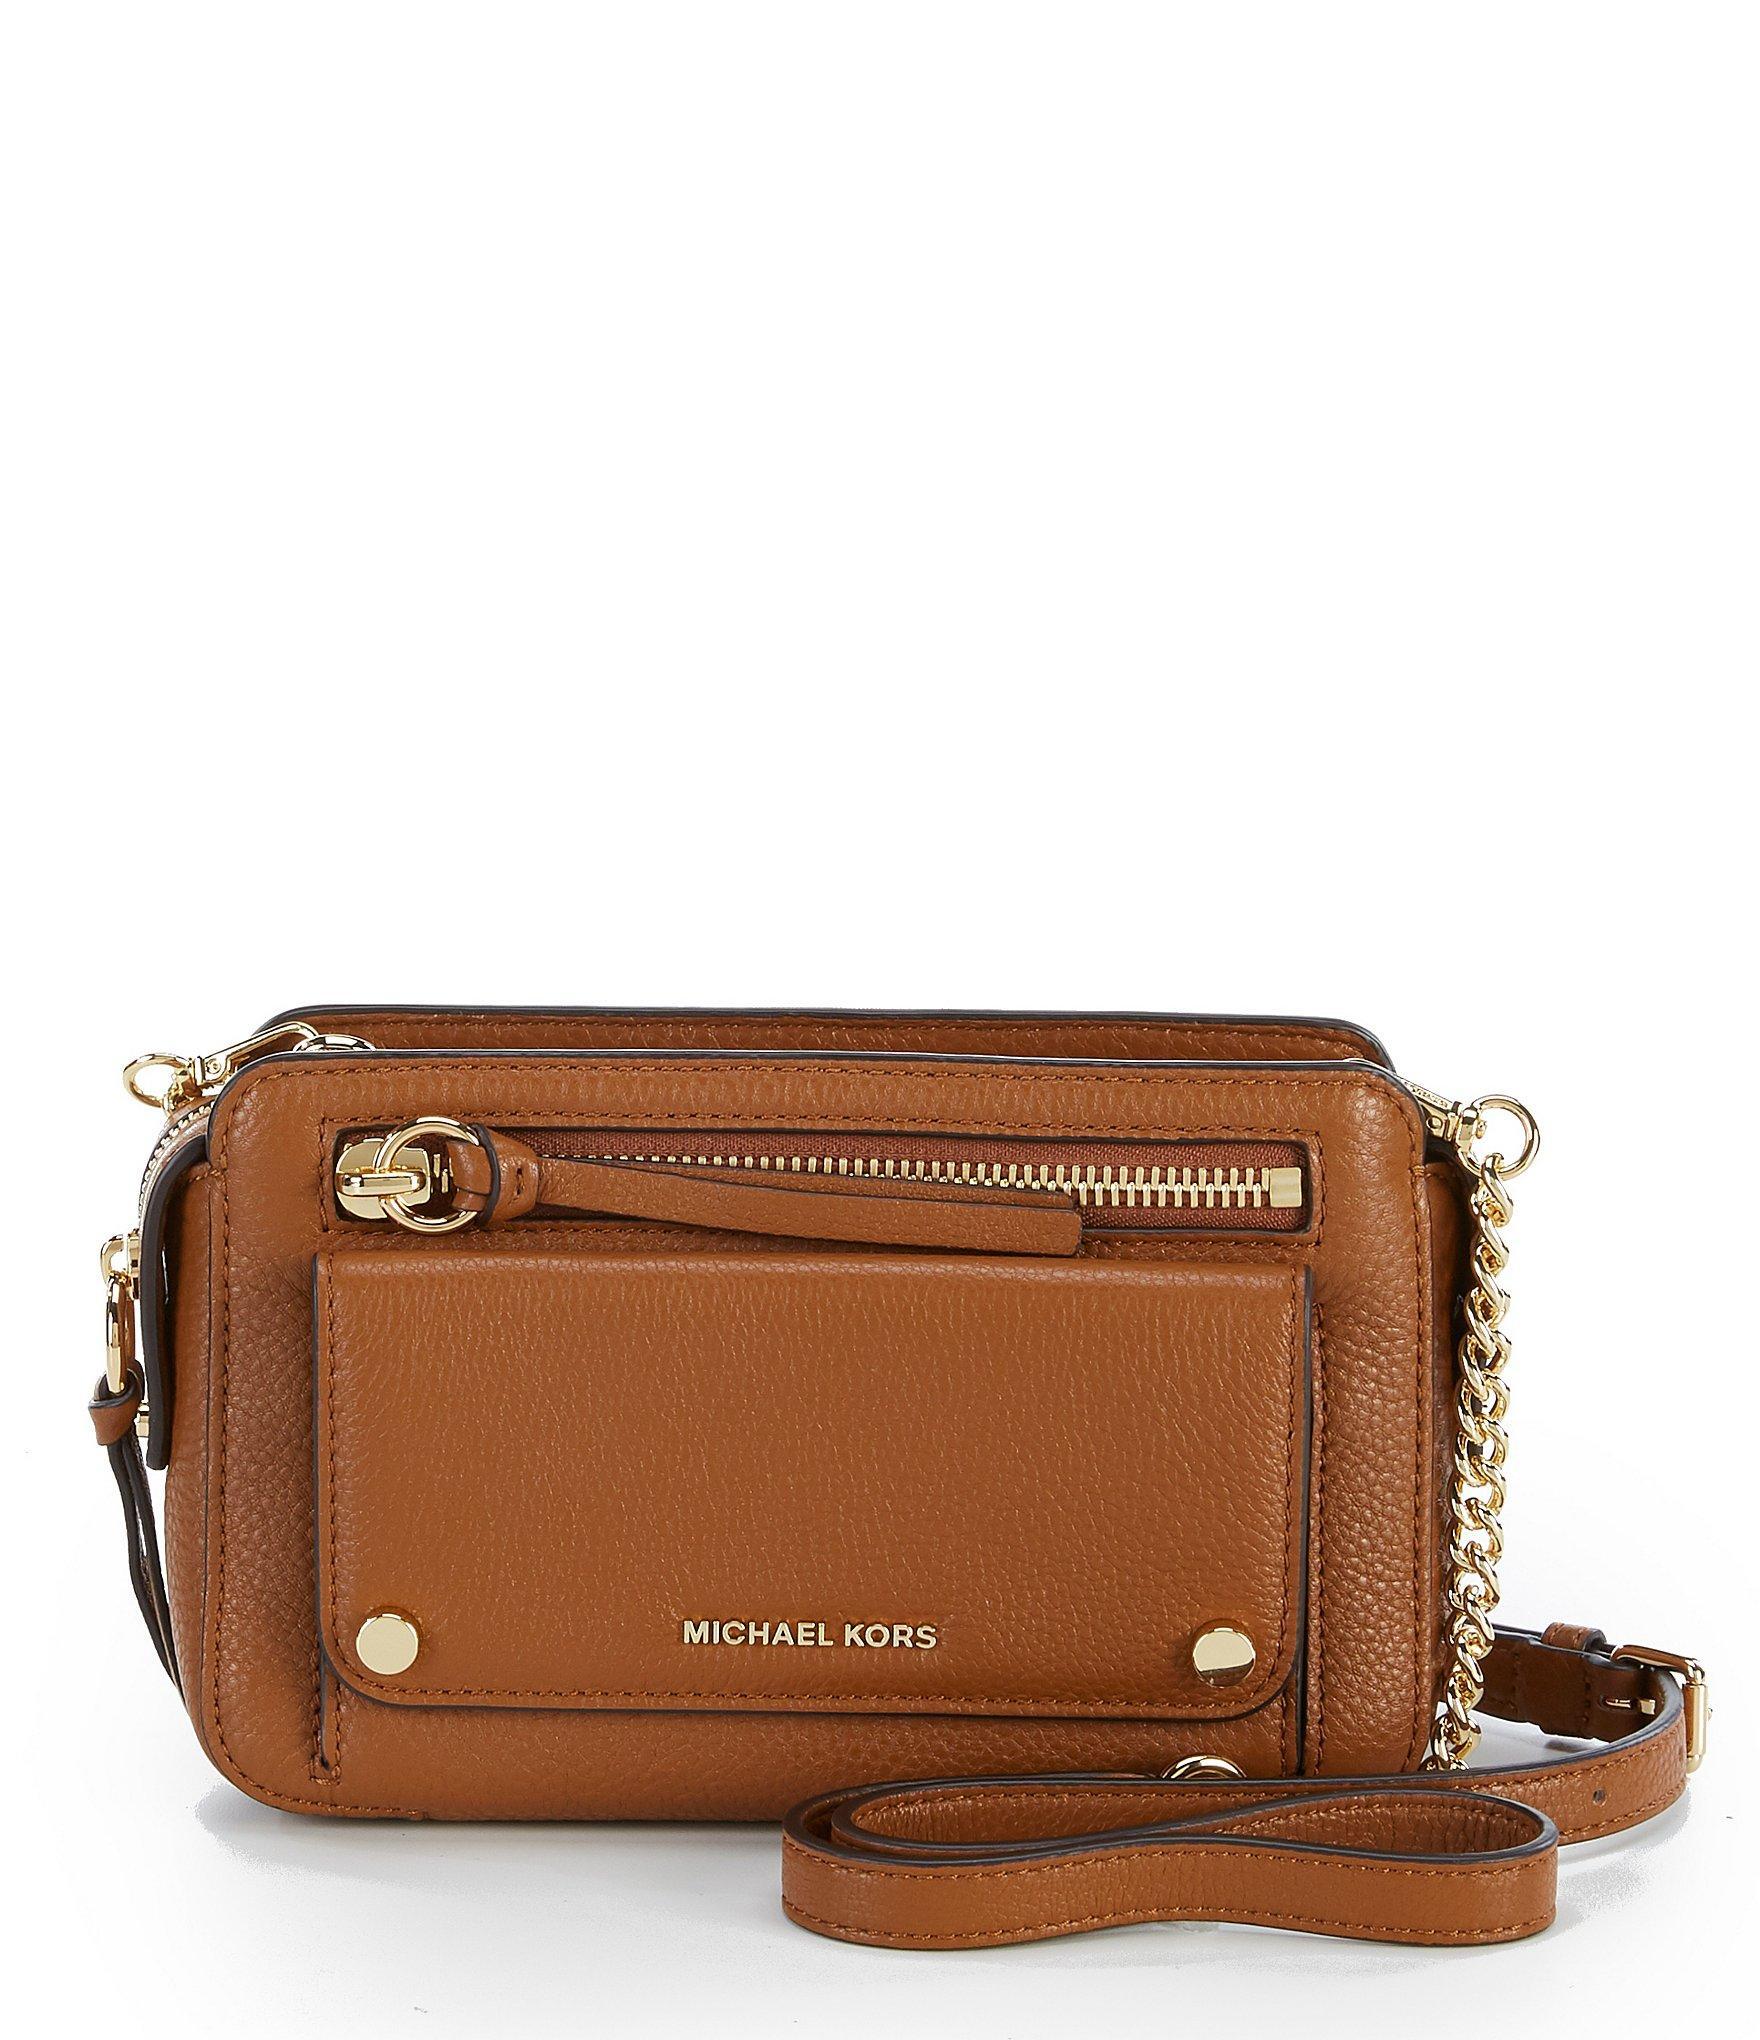 8f78a565b183 MICHAEL Michael Kors Mitchell Medium Cross-body Bag in Brown - Lyst